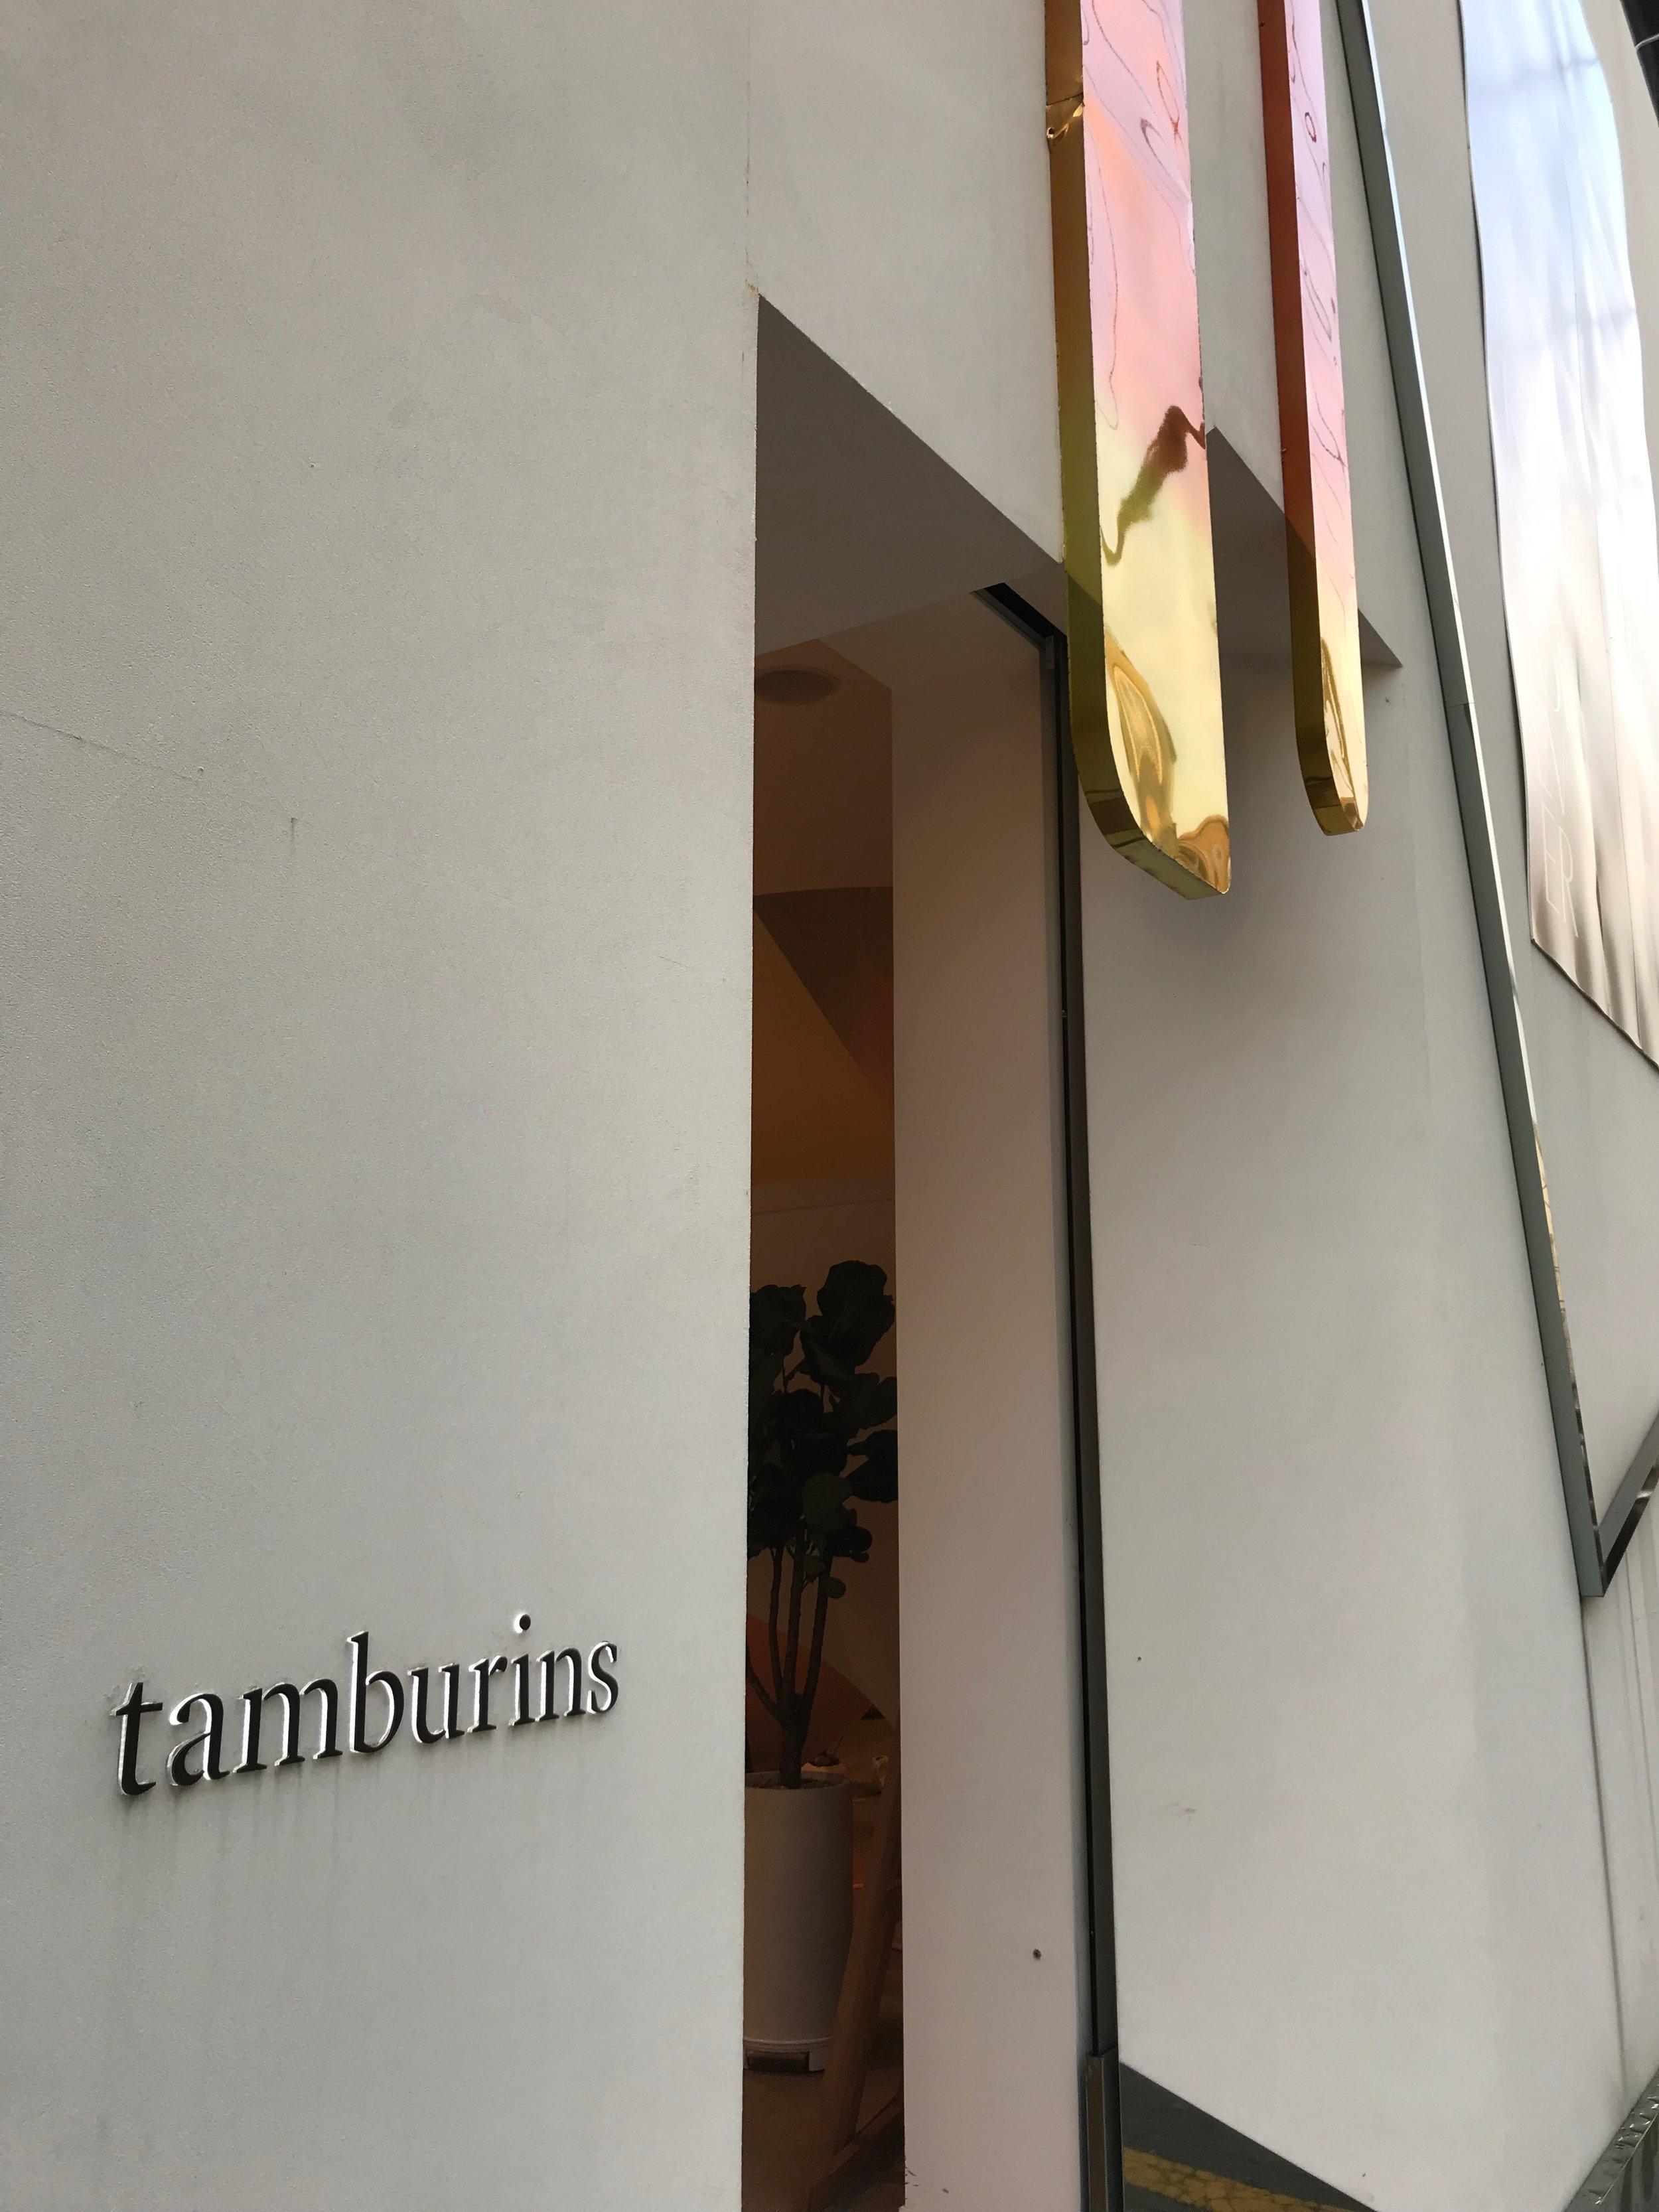 Tamburins beauty concept store, Seoul